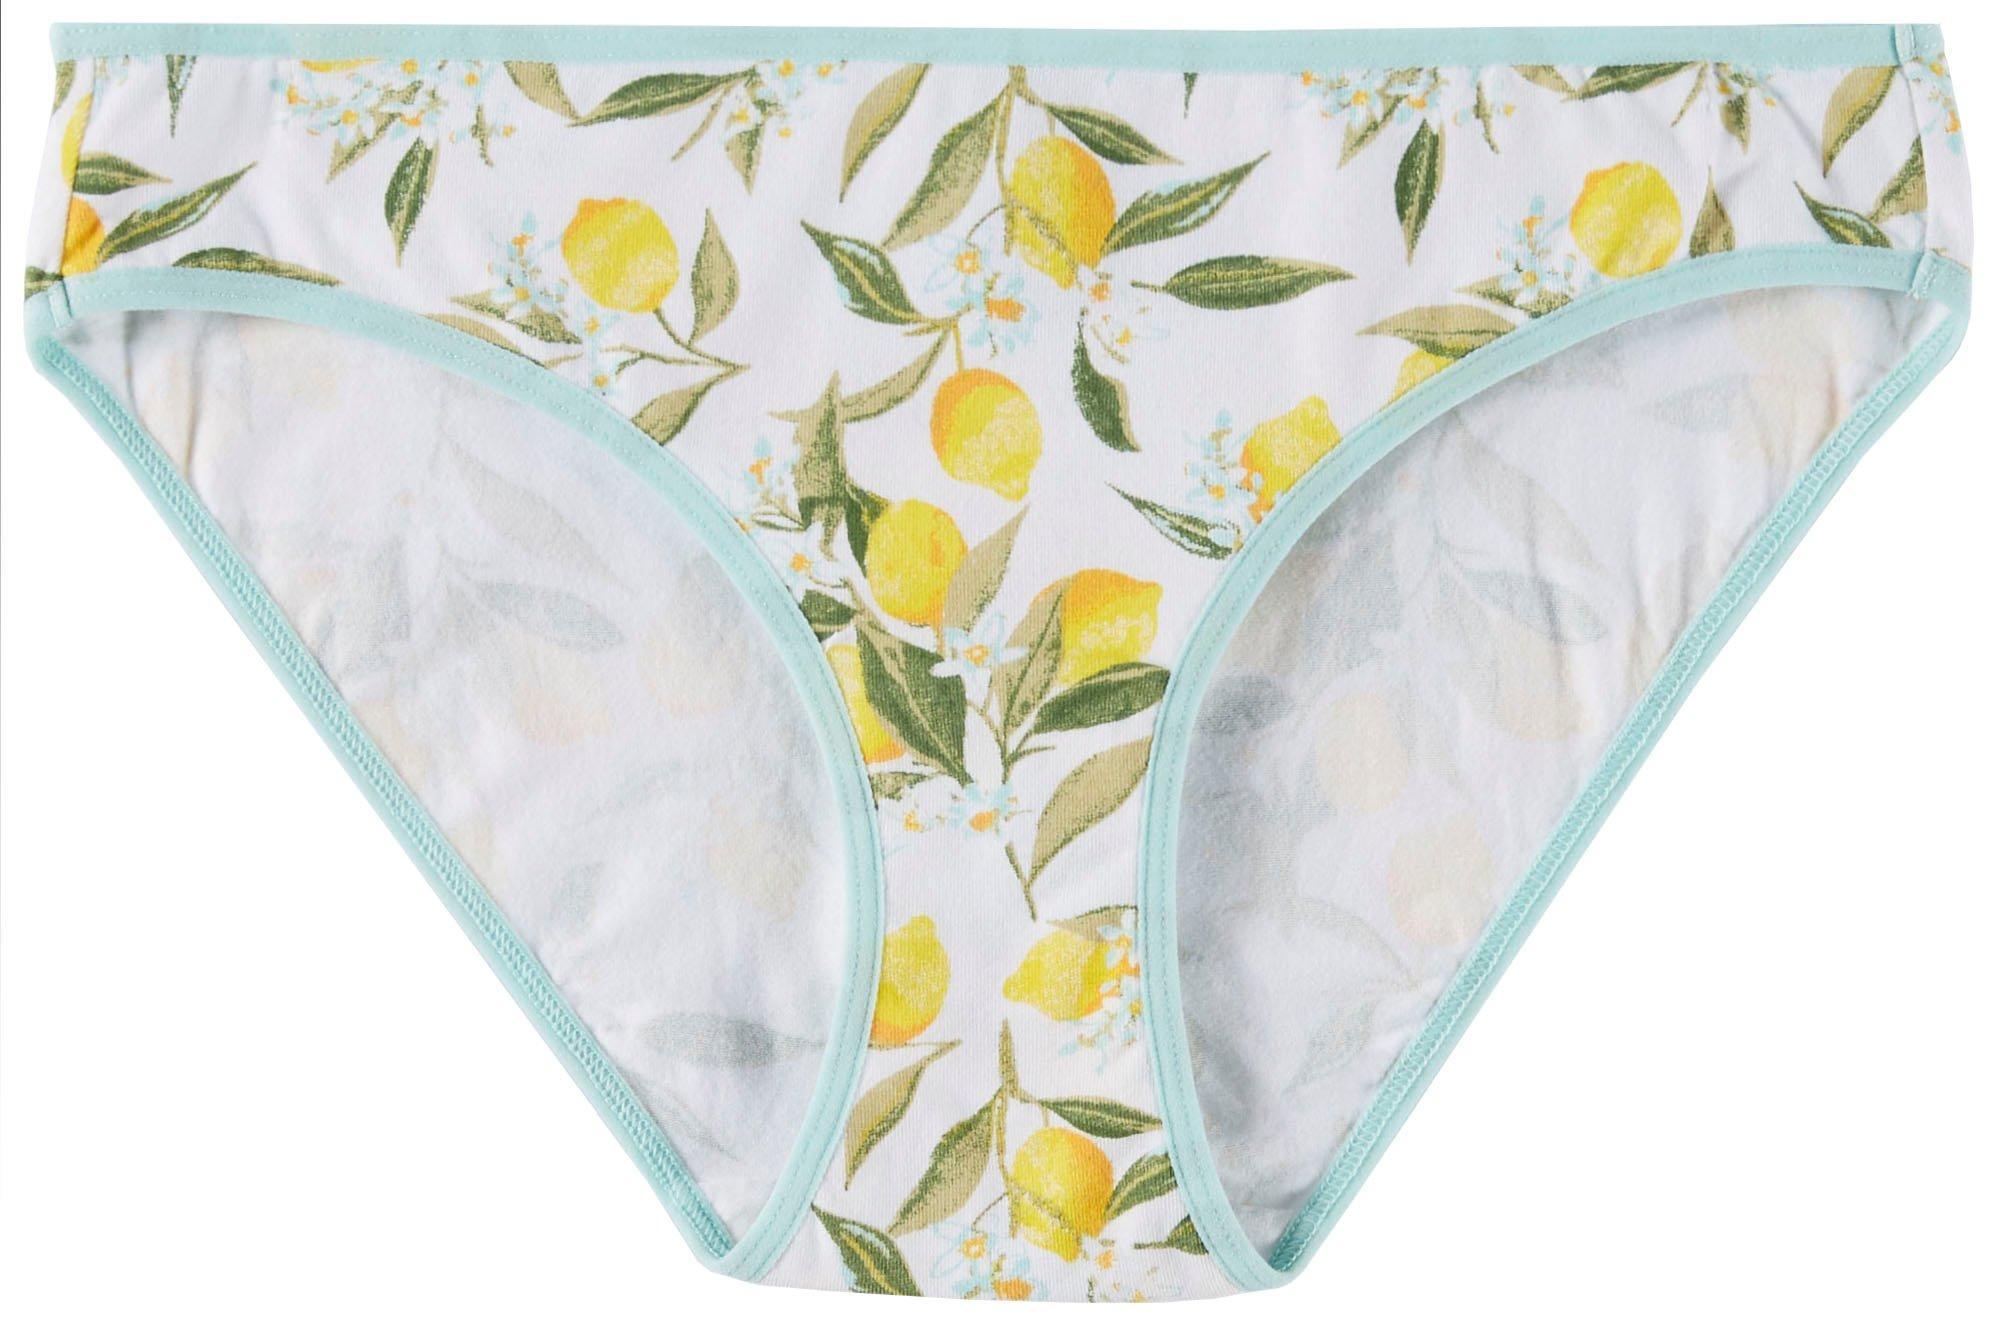 Wurl Juniors Cotton Spandex Thong Panties BE12206